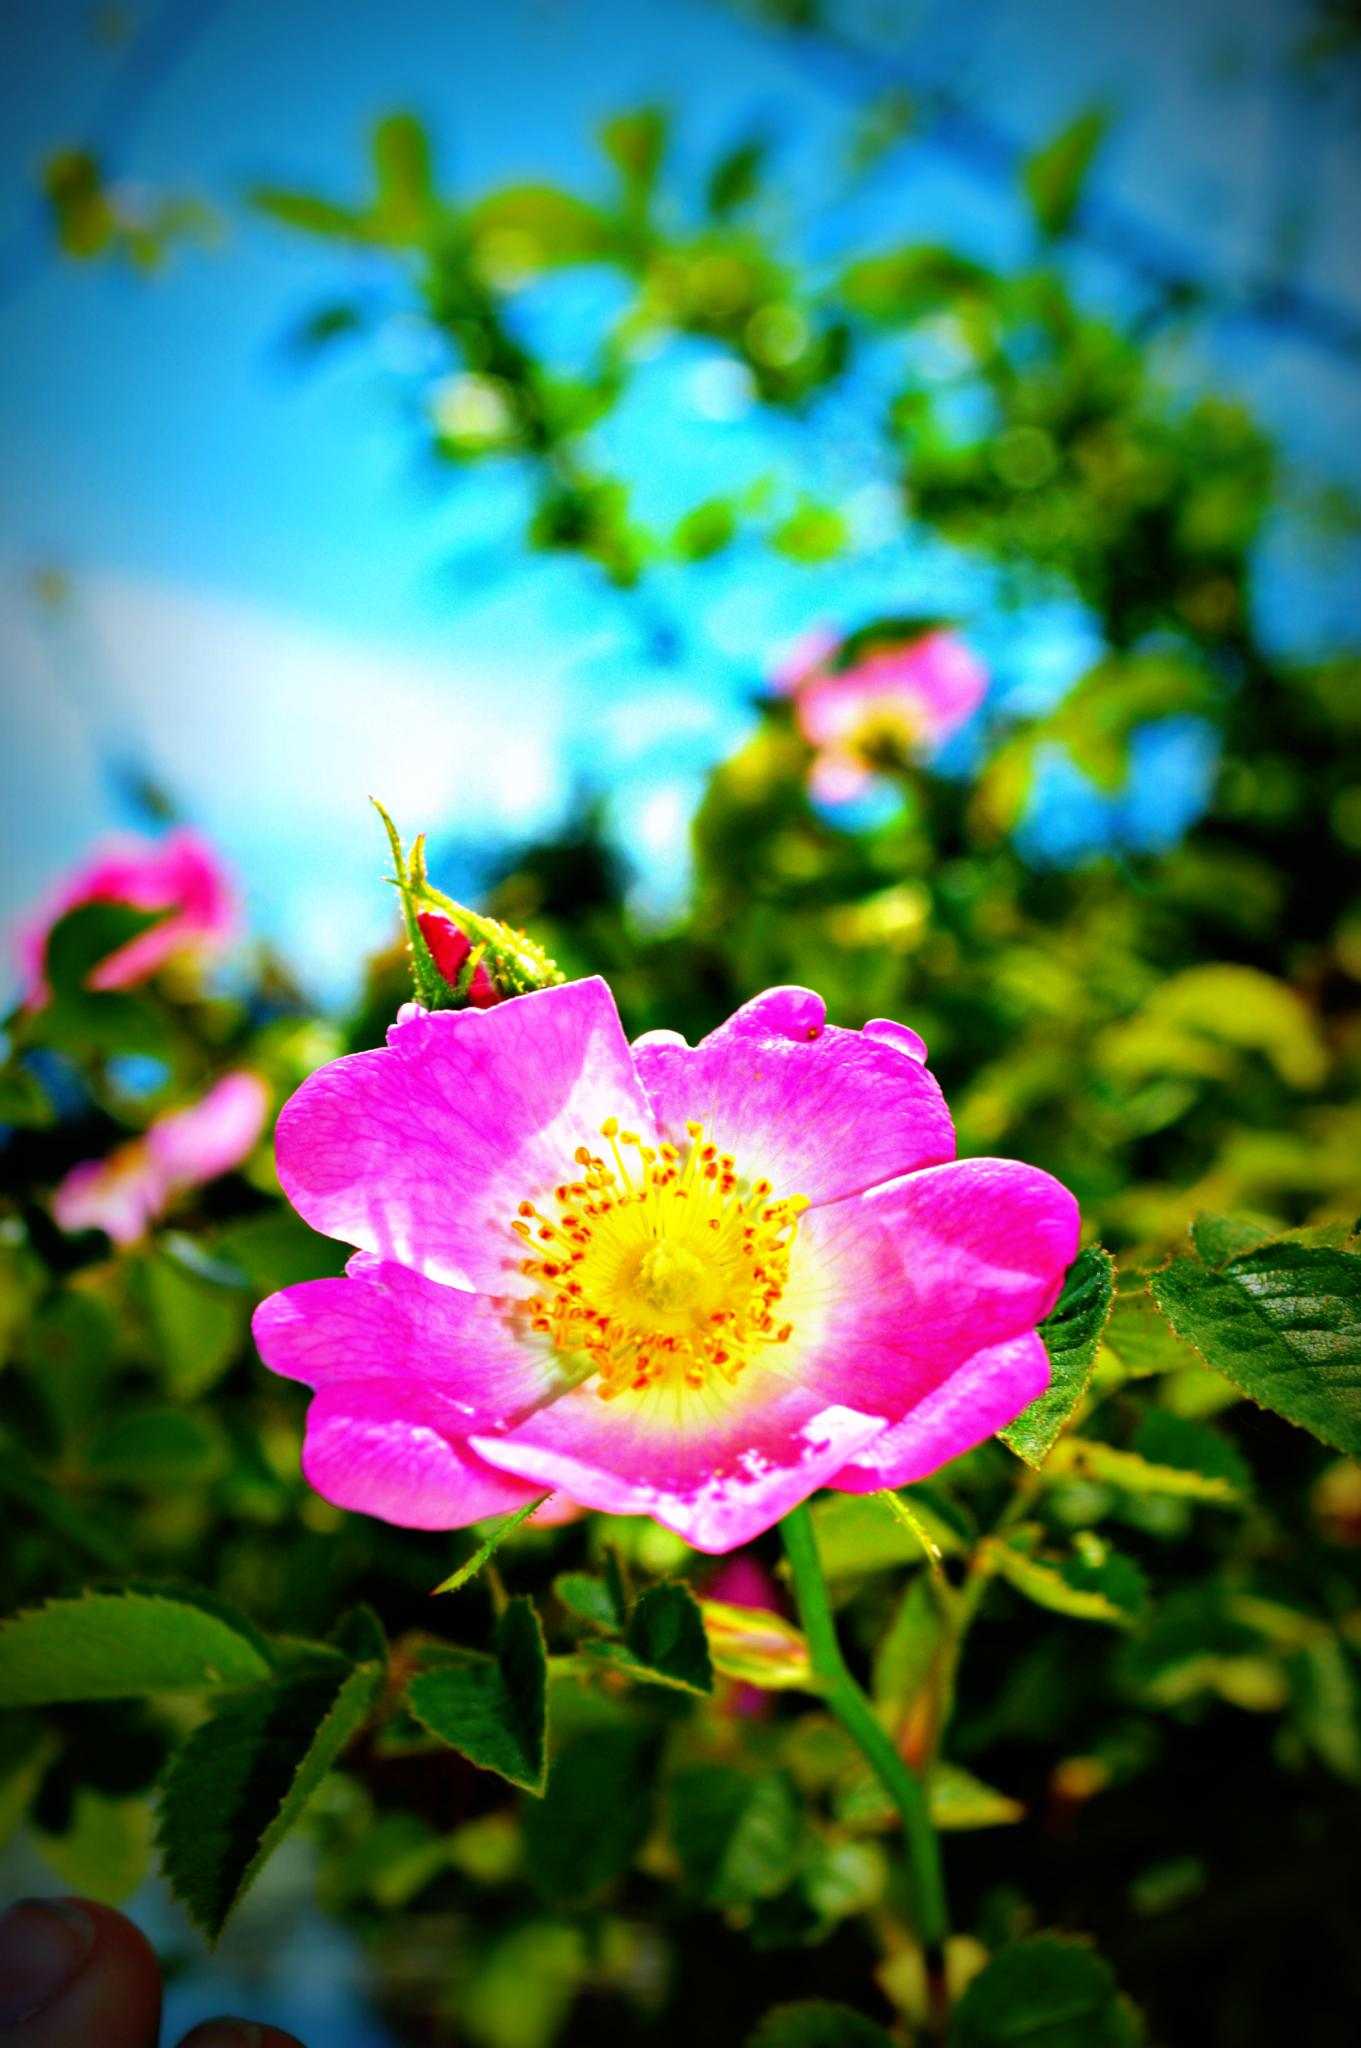 Wild roses by SashaMarie Photography